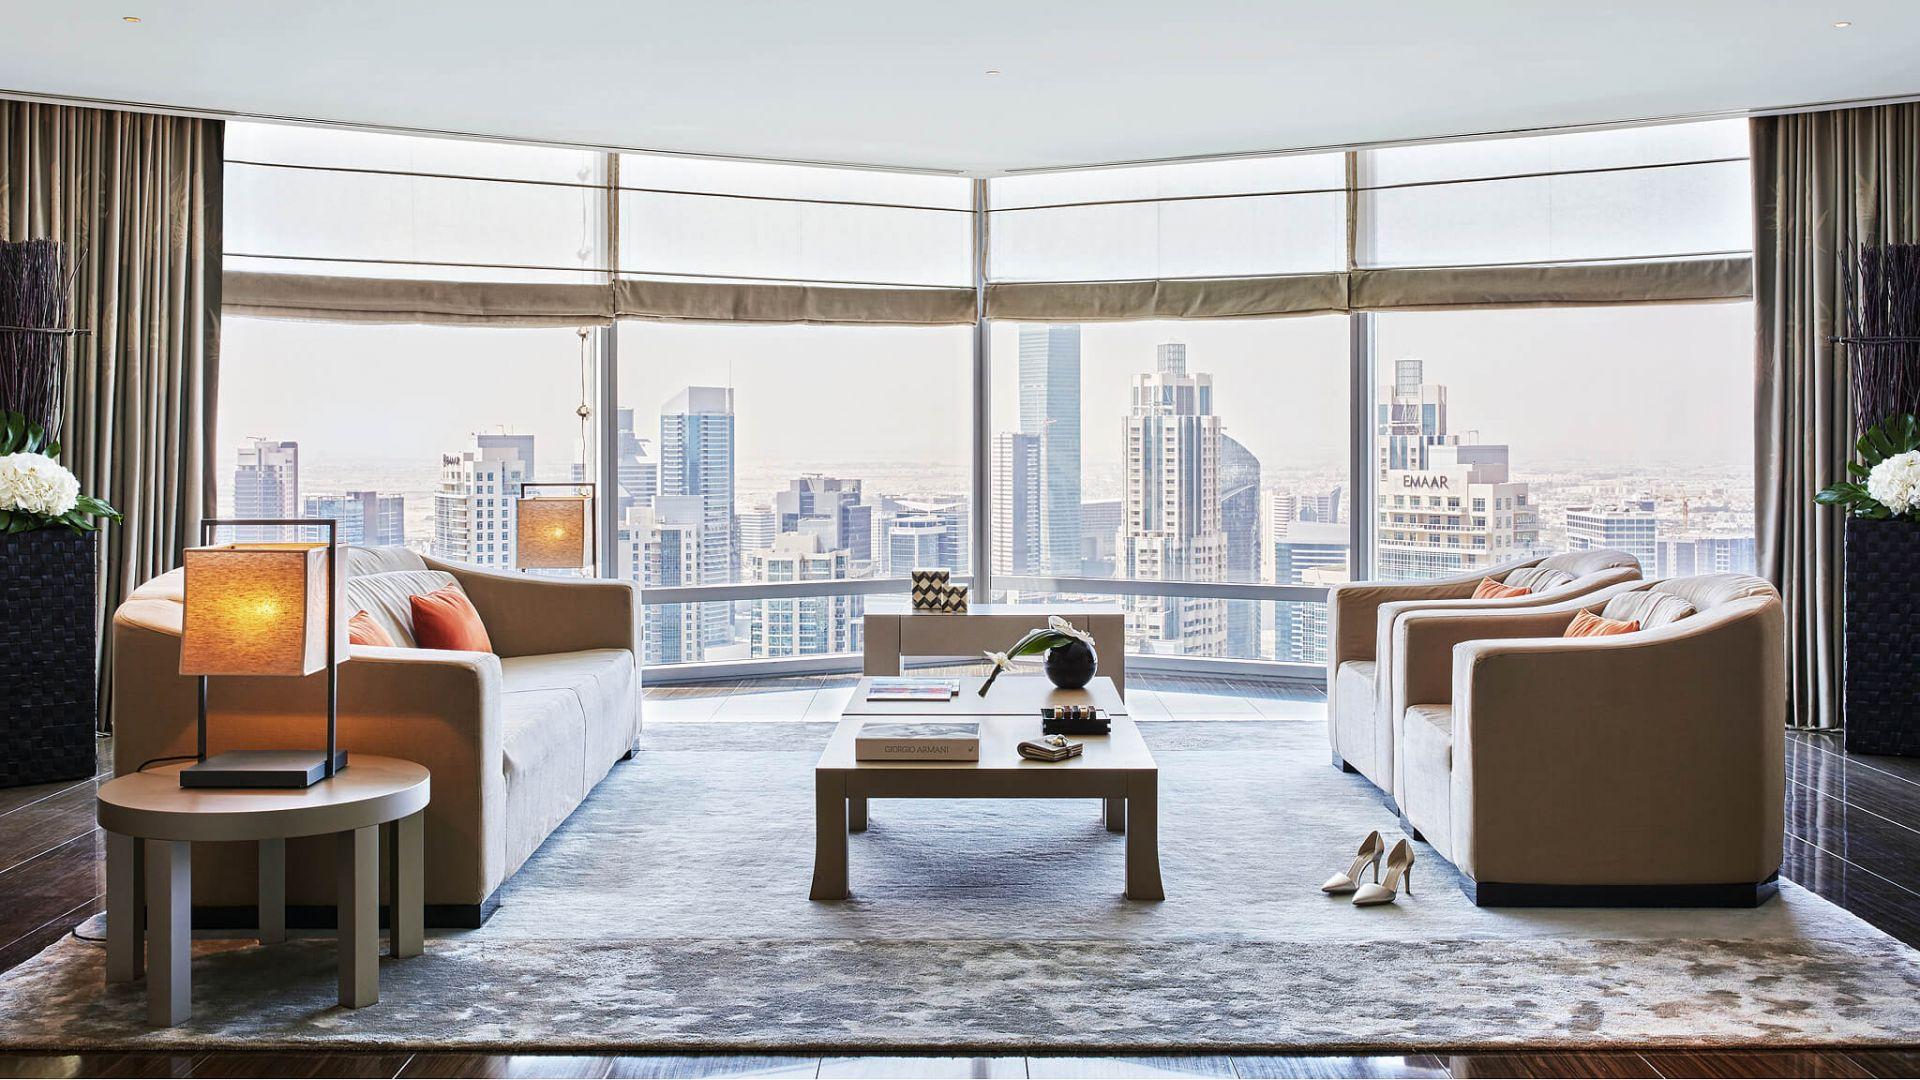 006148-06-Armani Hotel Dubai-signature suite living room.jpg